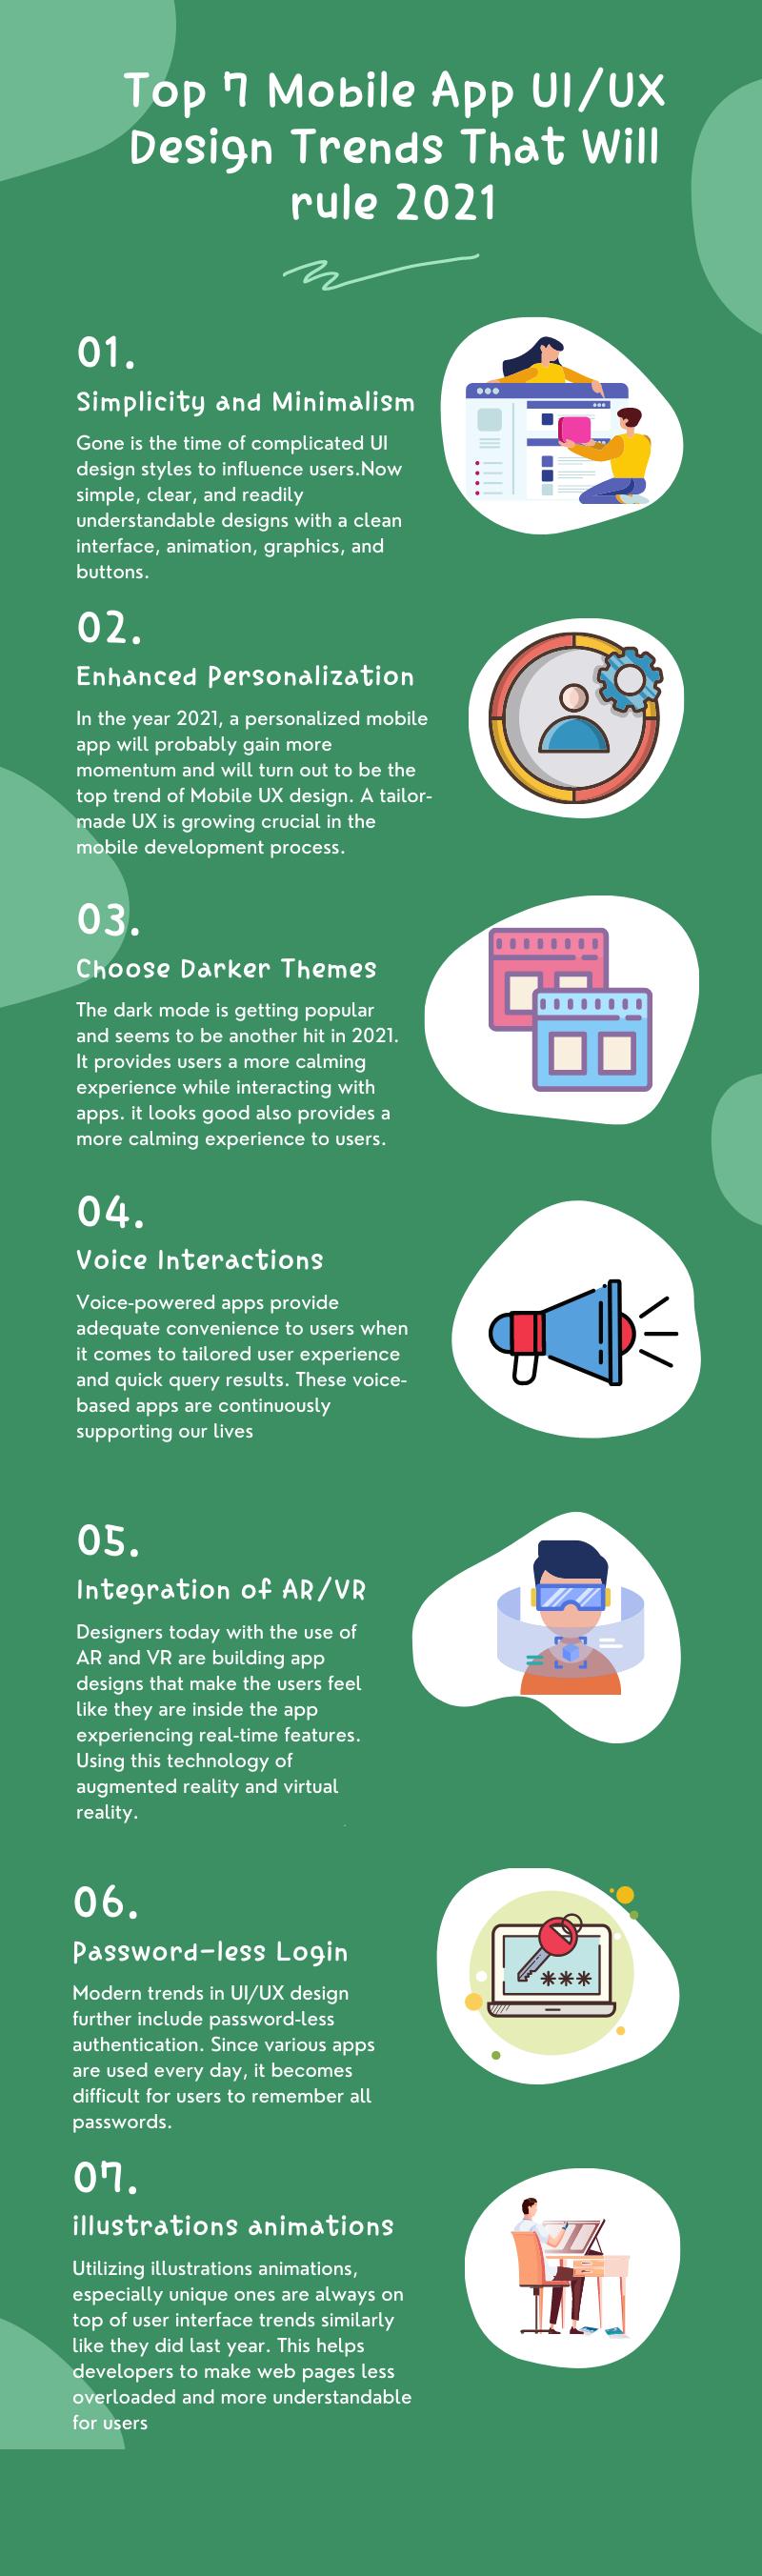 Mobile App UI/UX Design Trends infographic